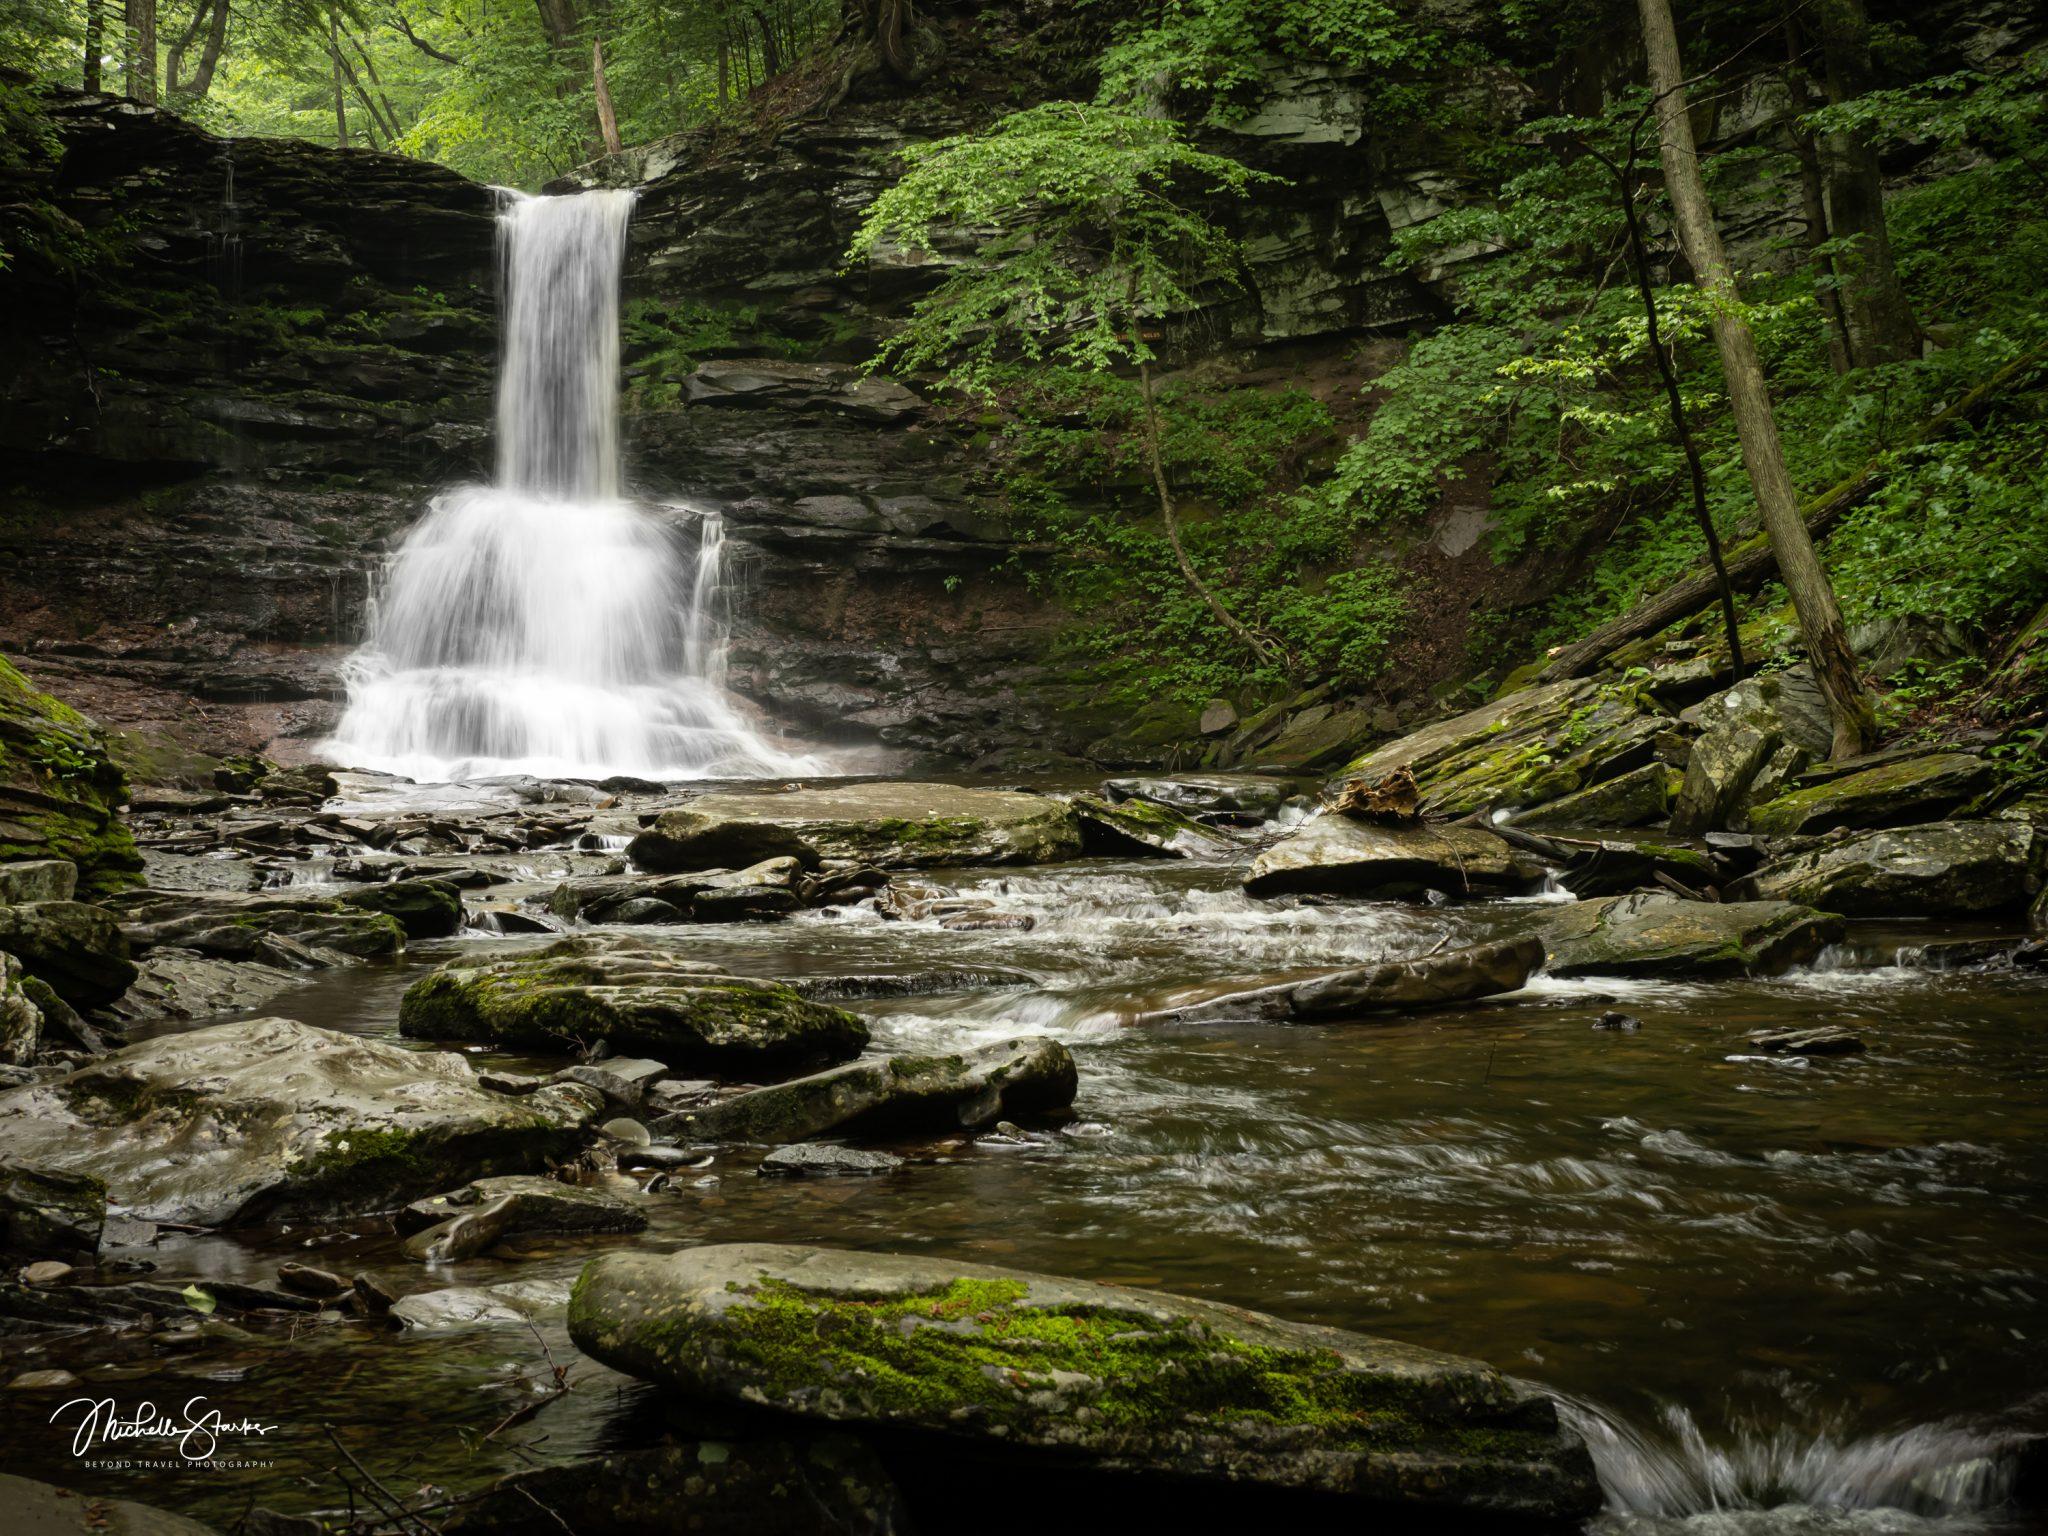 Sheldon Reynolds Waterfalls, Ricketts Glen State Park, PA 6/3/21